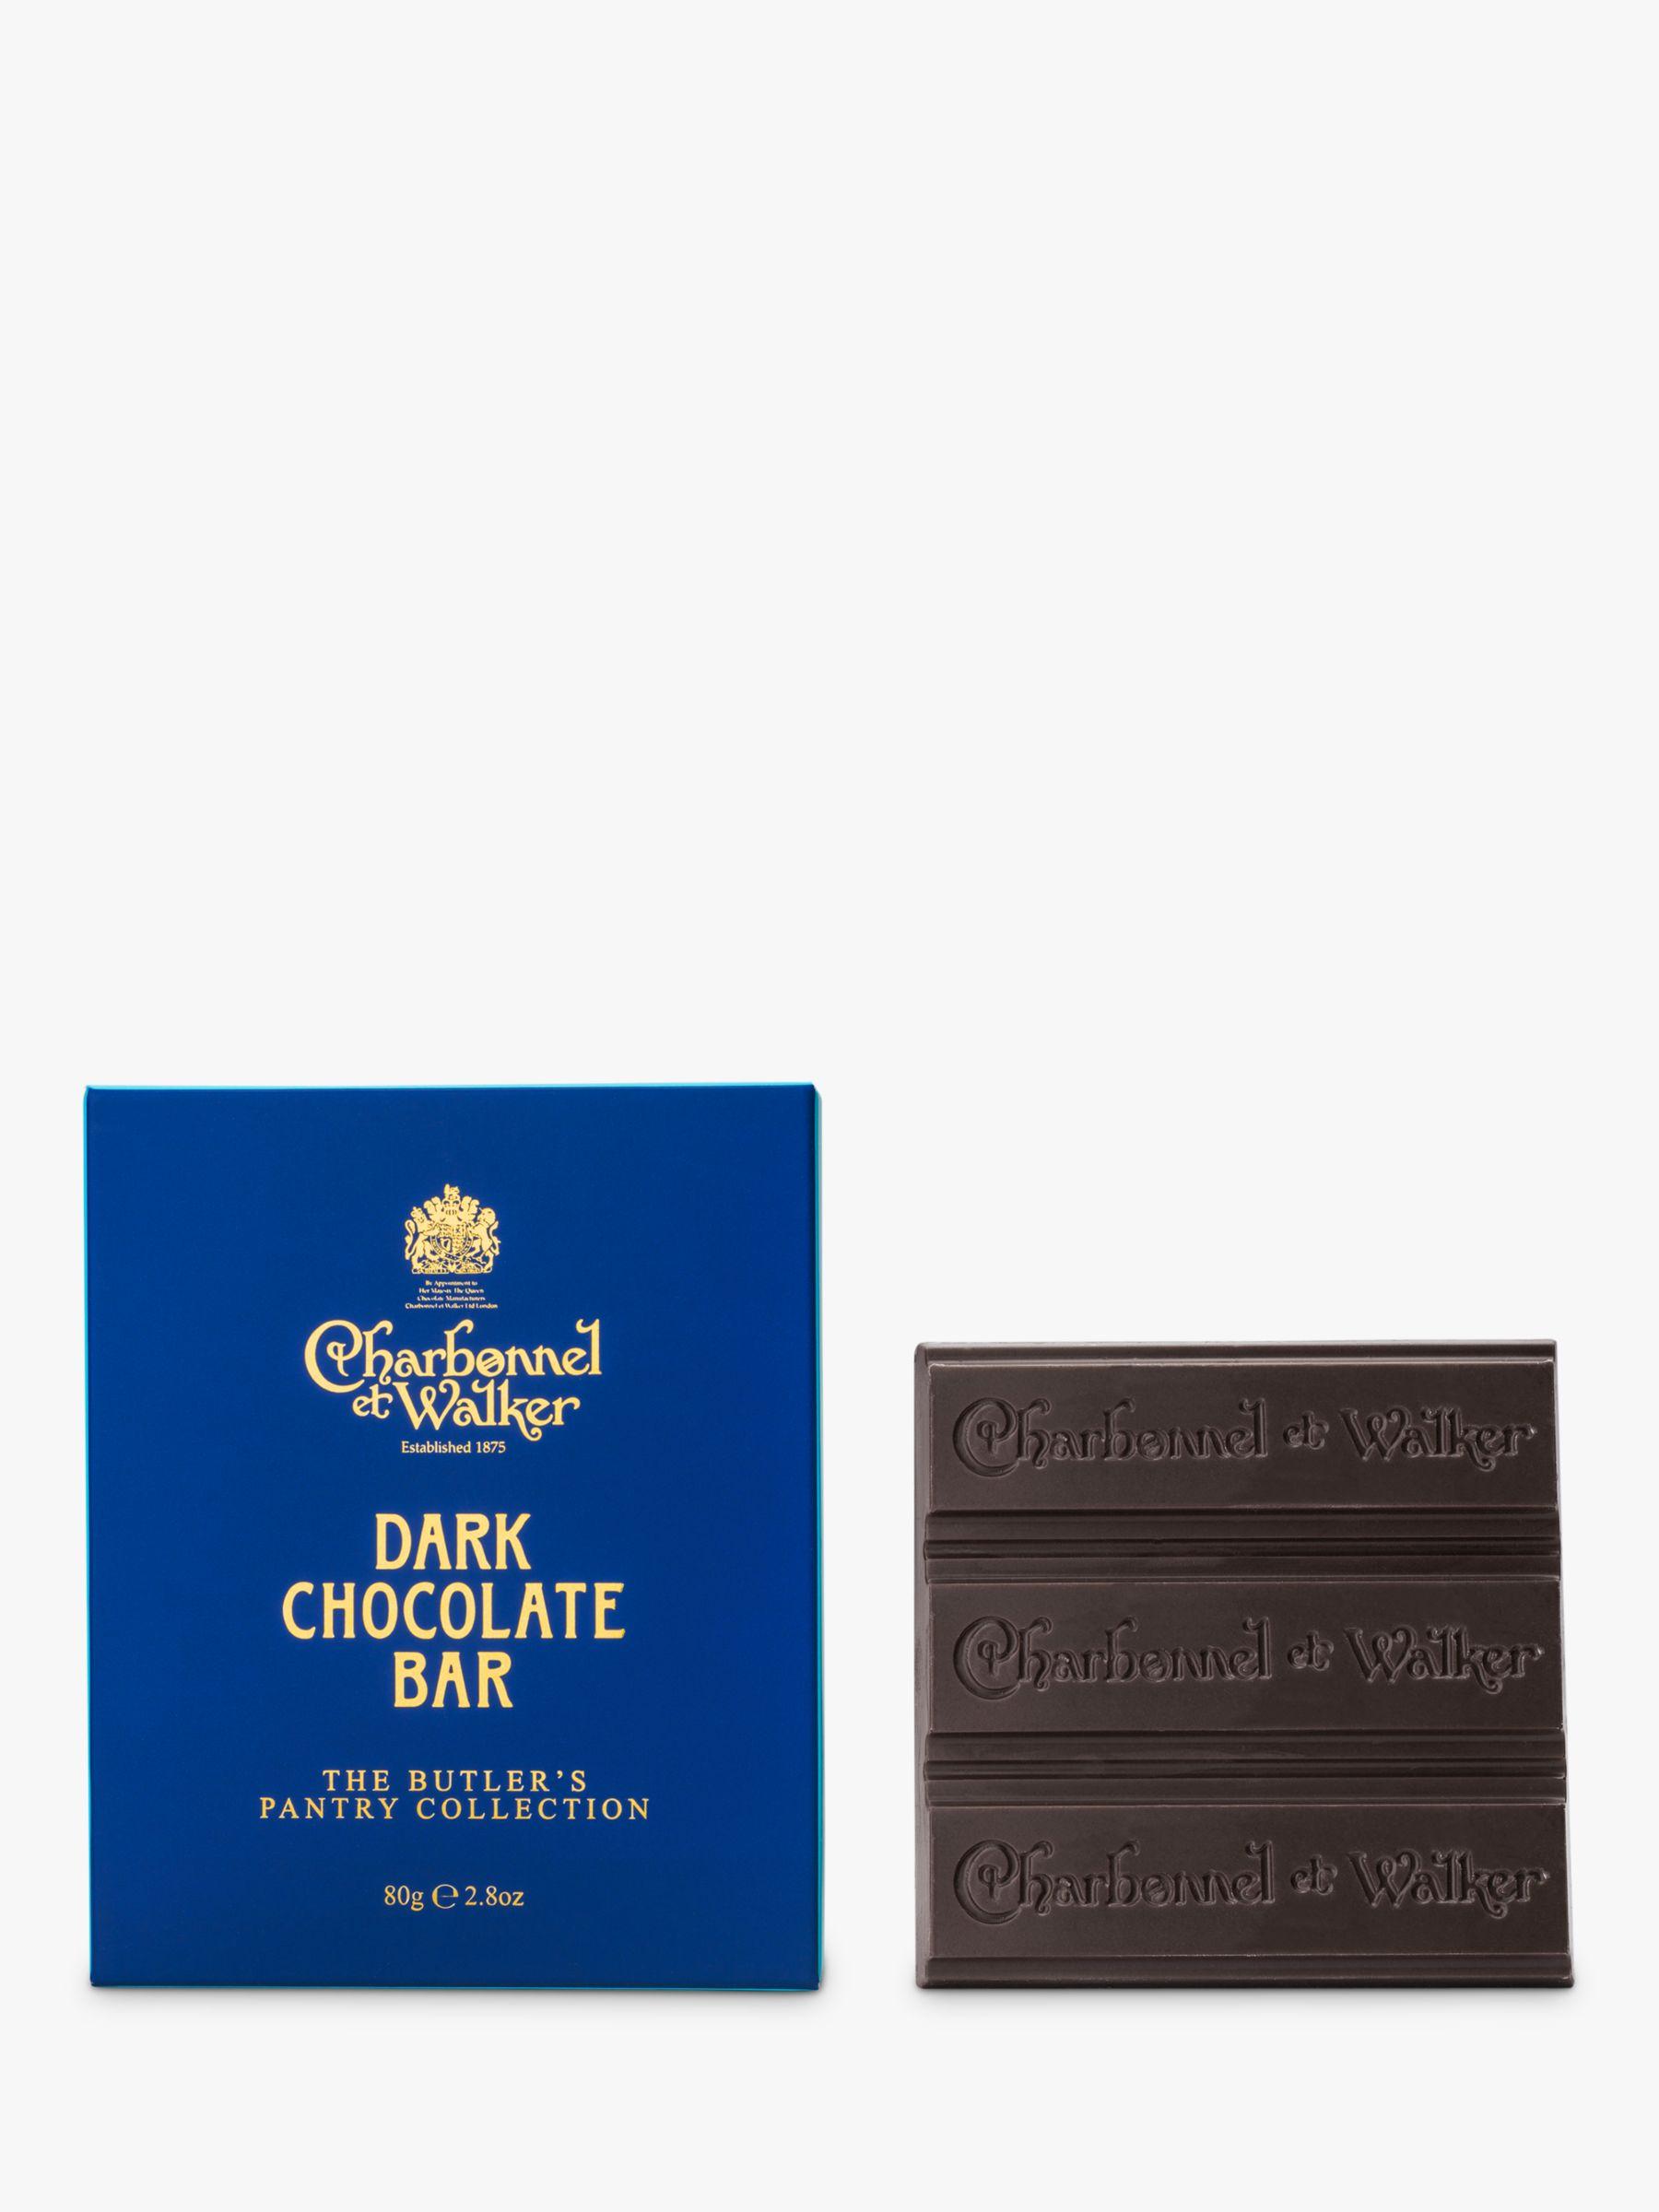 Charbonnel et Walker Charbonnel et Walker Butler's Pantry Collection Dark Chocolate Bar, 80g